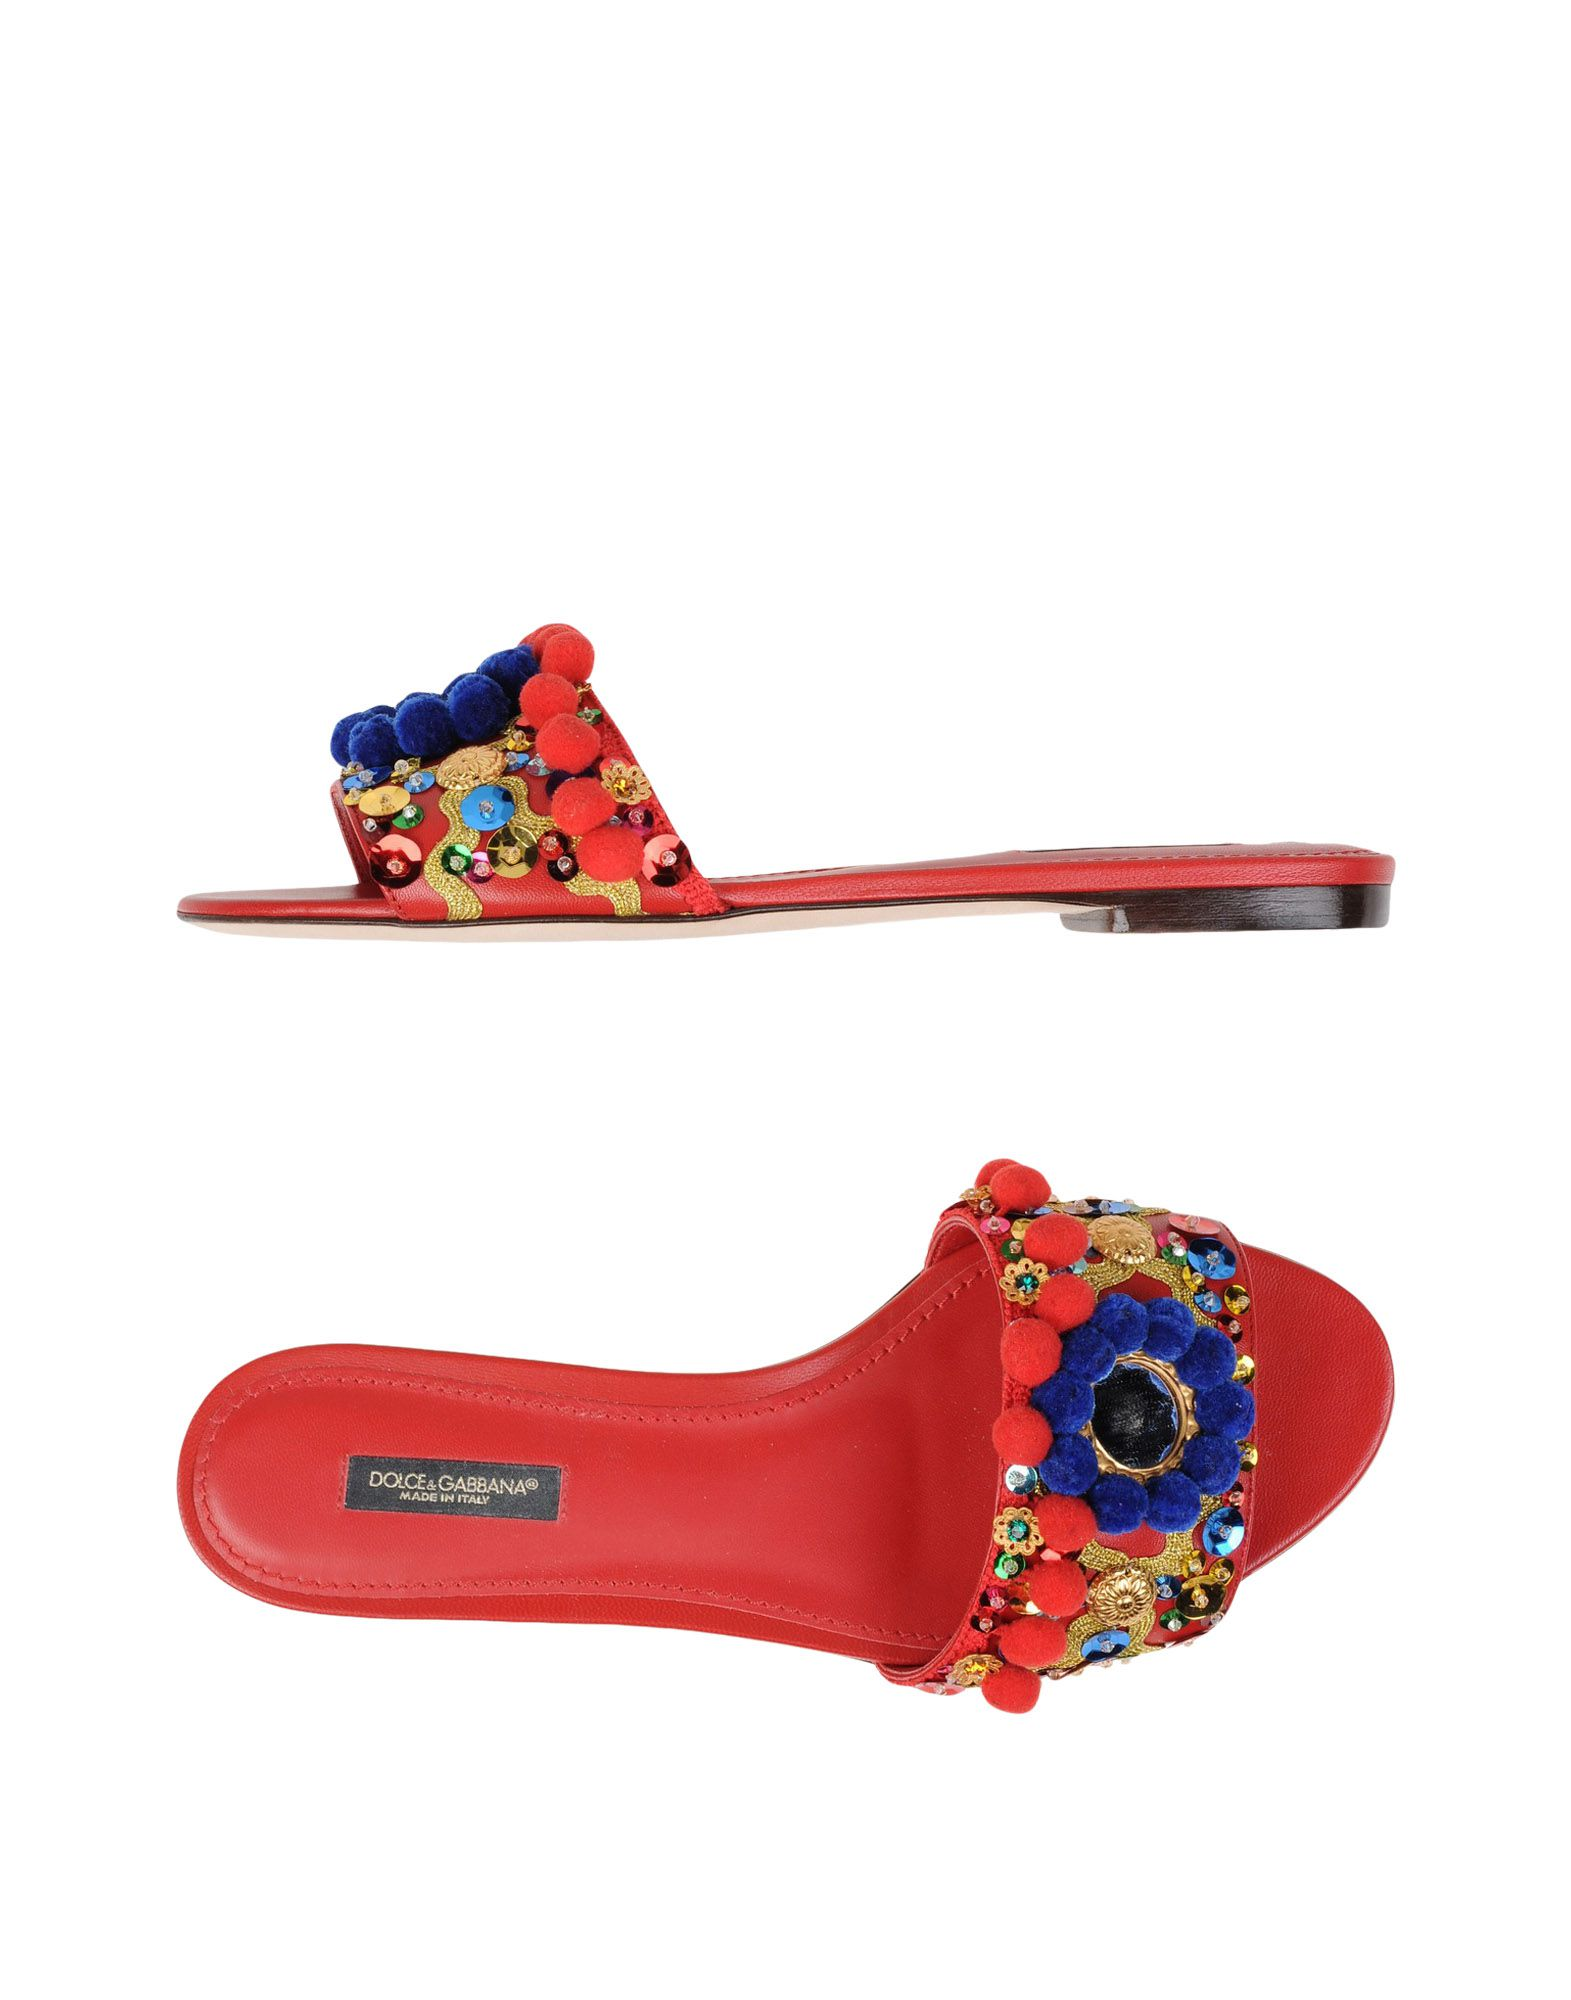 DOLCE & GABBANA Damen Sandale Farbe Rot Größe 5